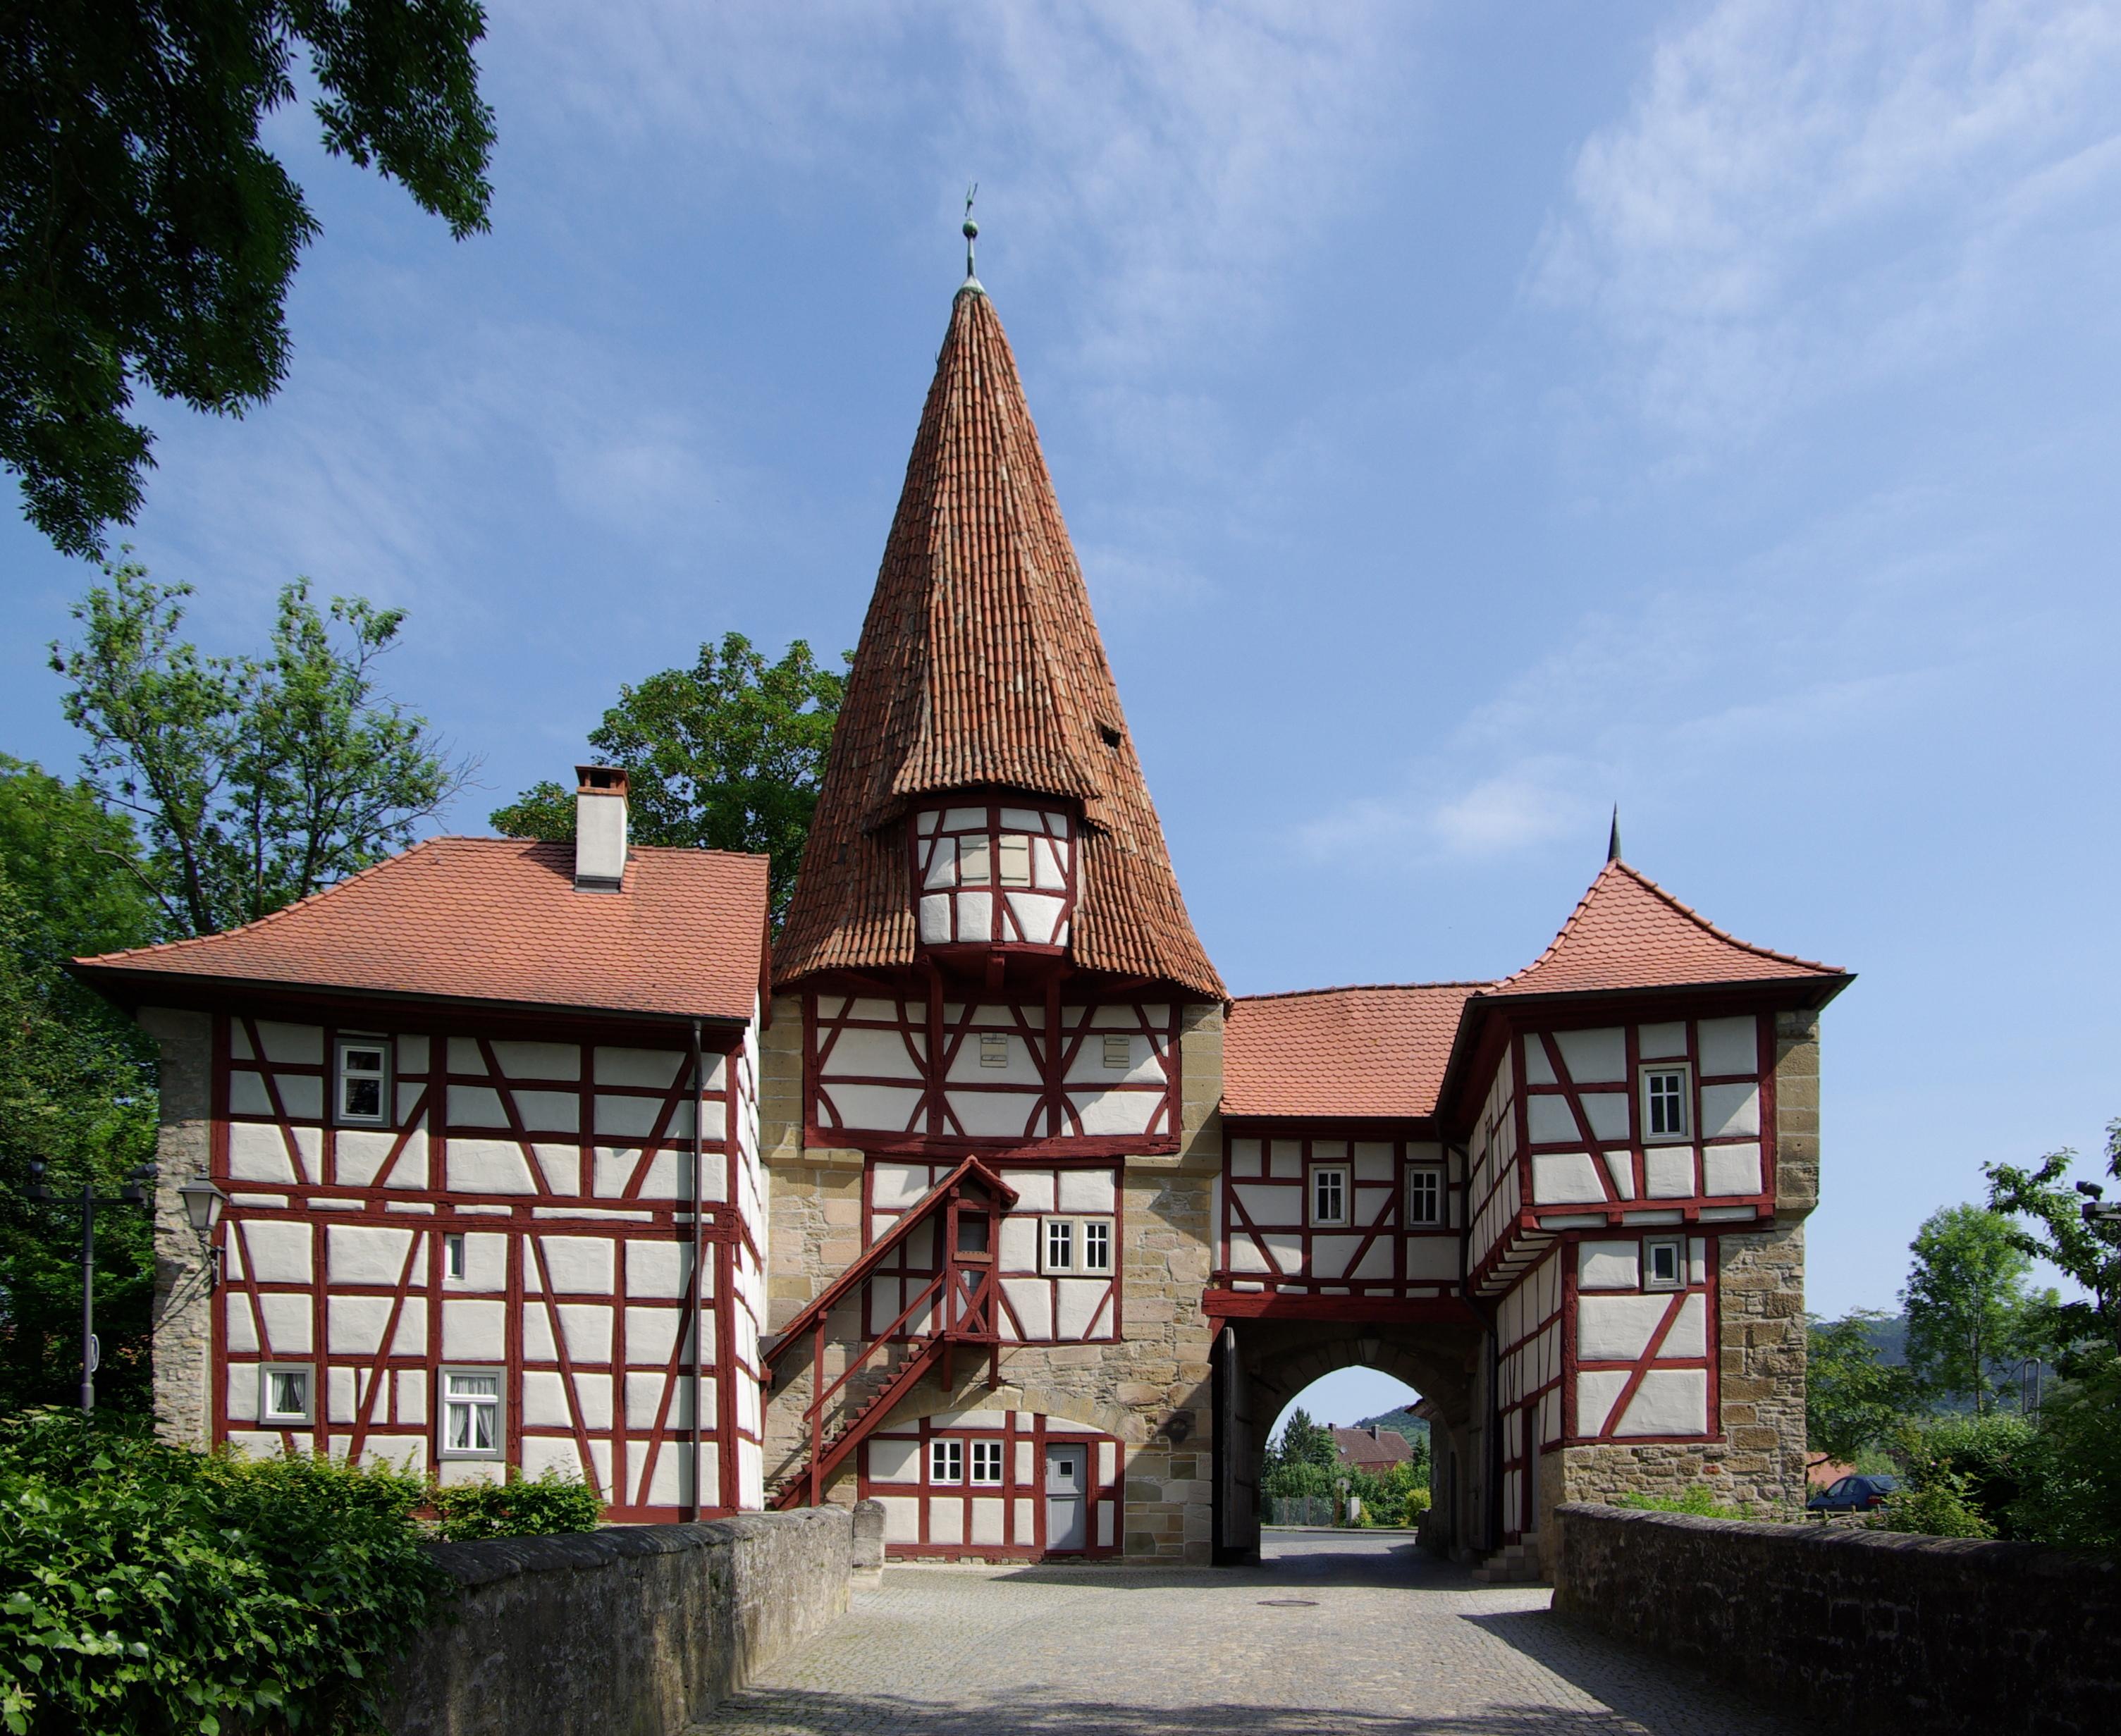 File:Iphofen BW 2.jpg - Wikimedia Commons